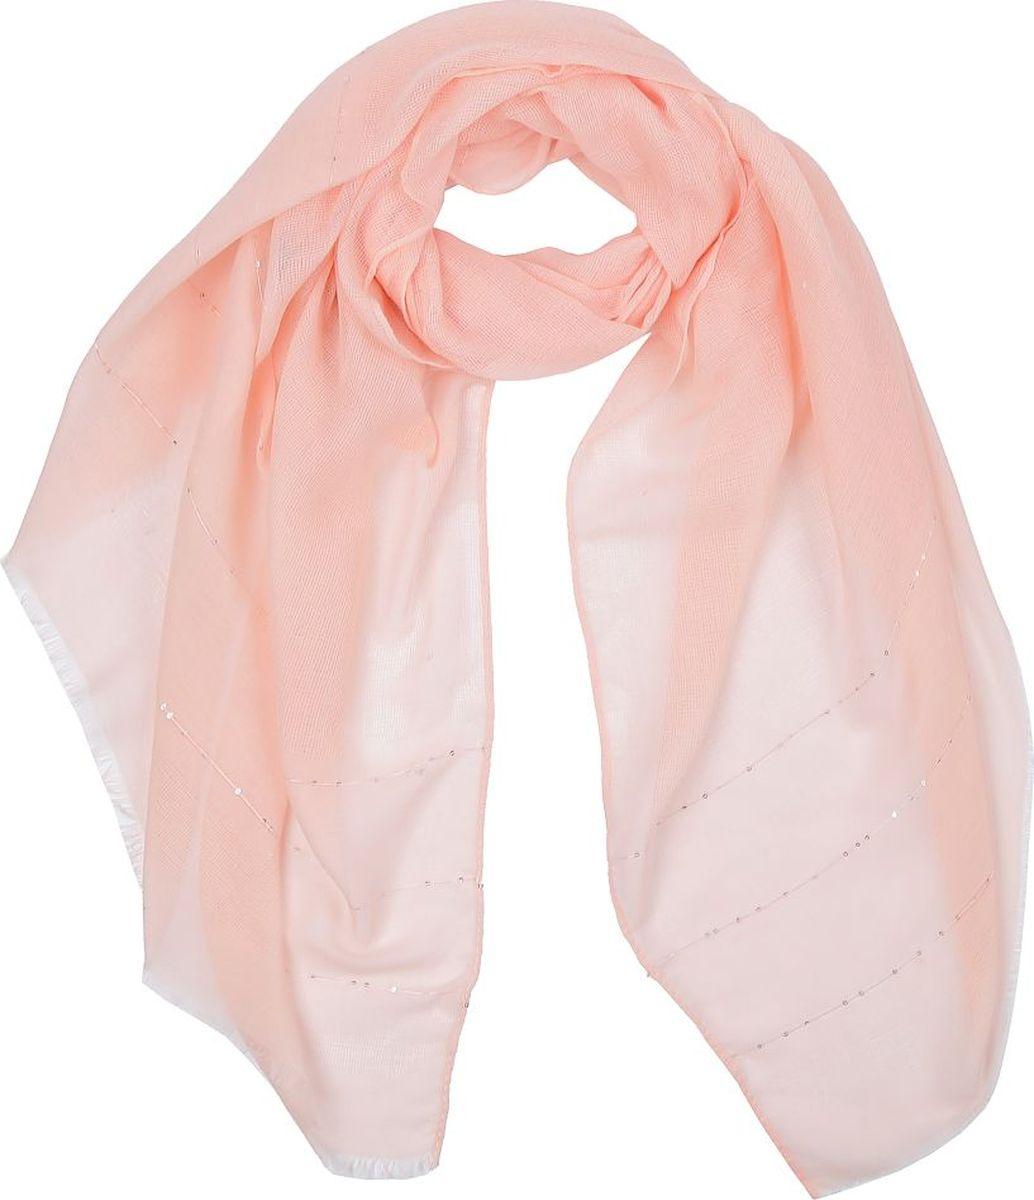 Шарф женский Fabretti, цвет: коралловый. WJ257-3. Размер 180 см х 90 см шарф женский sophie ramage цвет синий розовый зеленый yy 21402 3 размер 60 см х 180 см